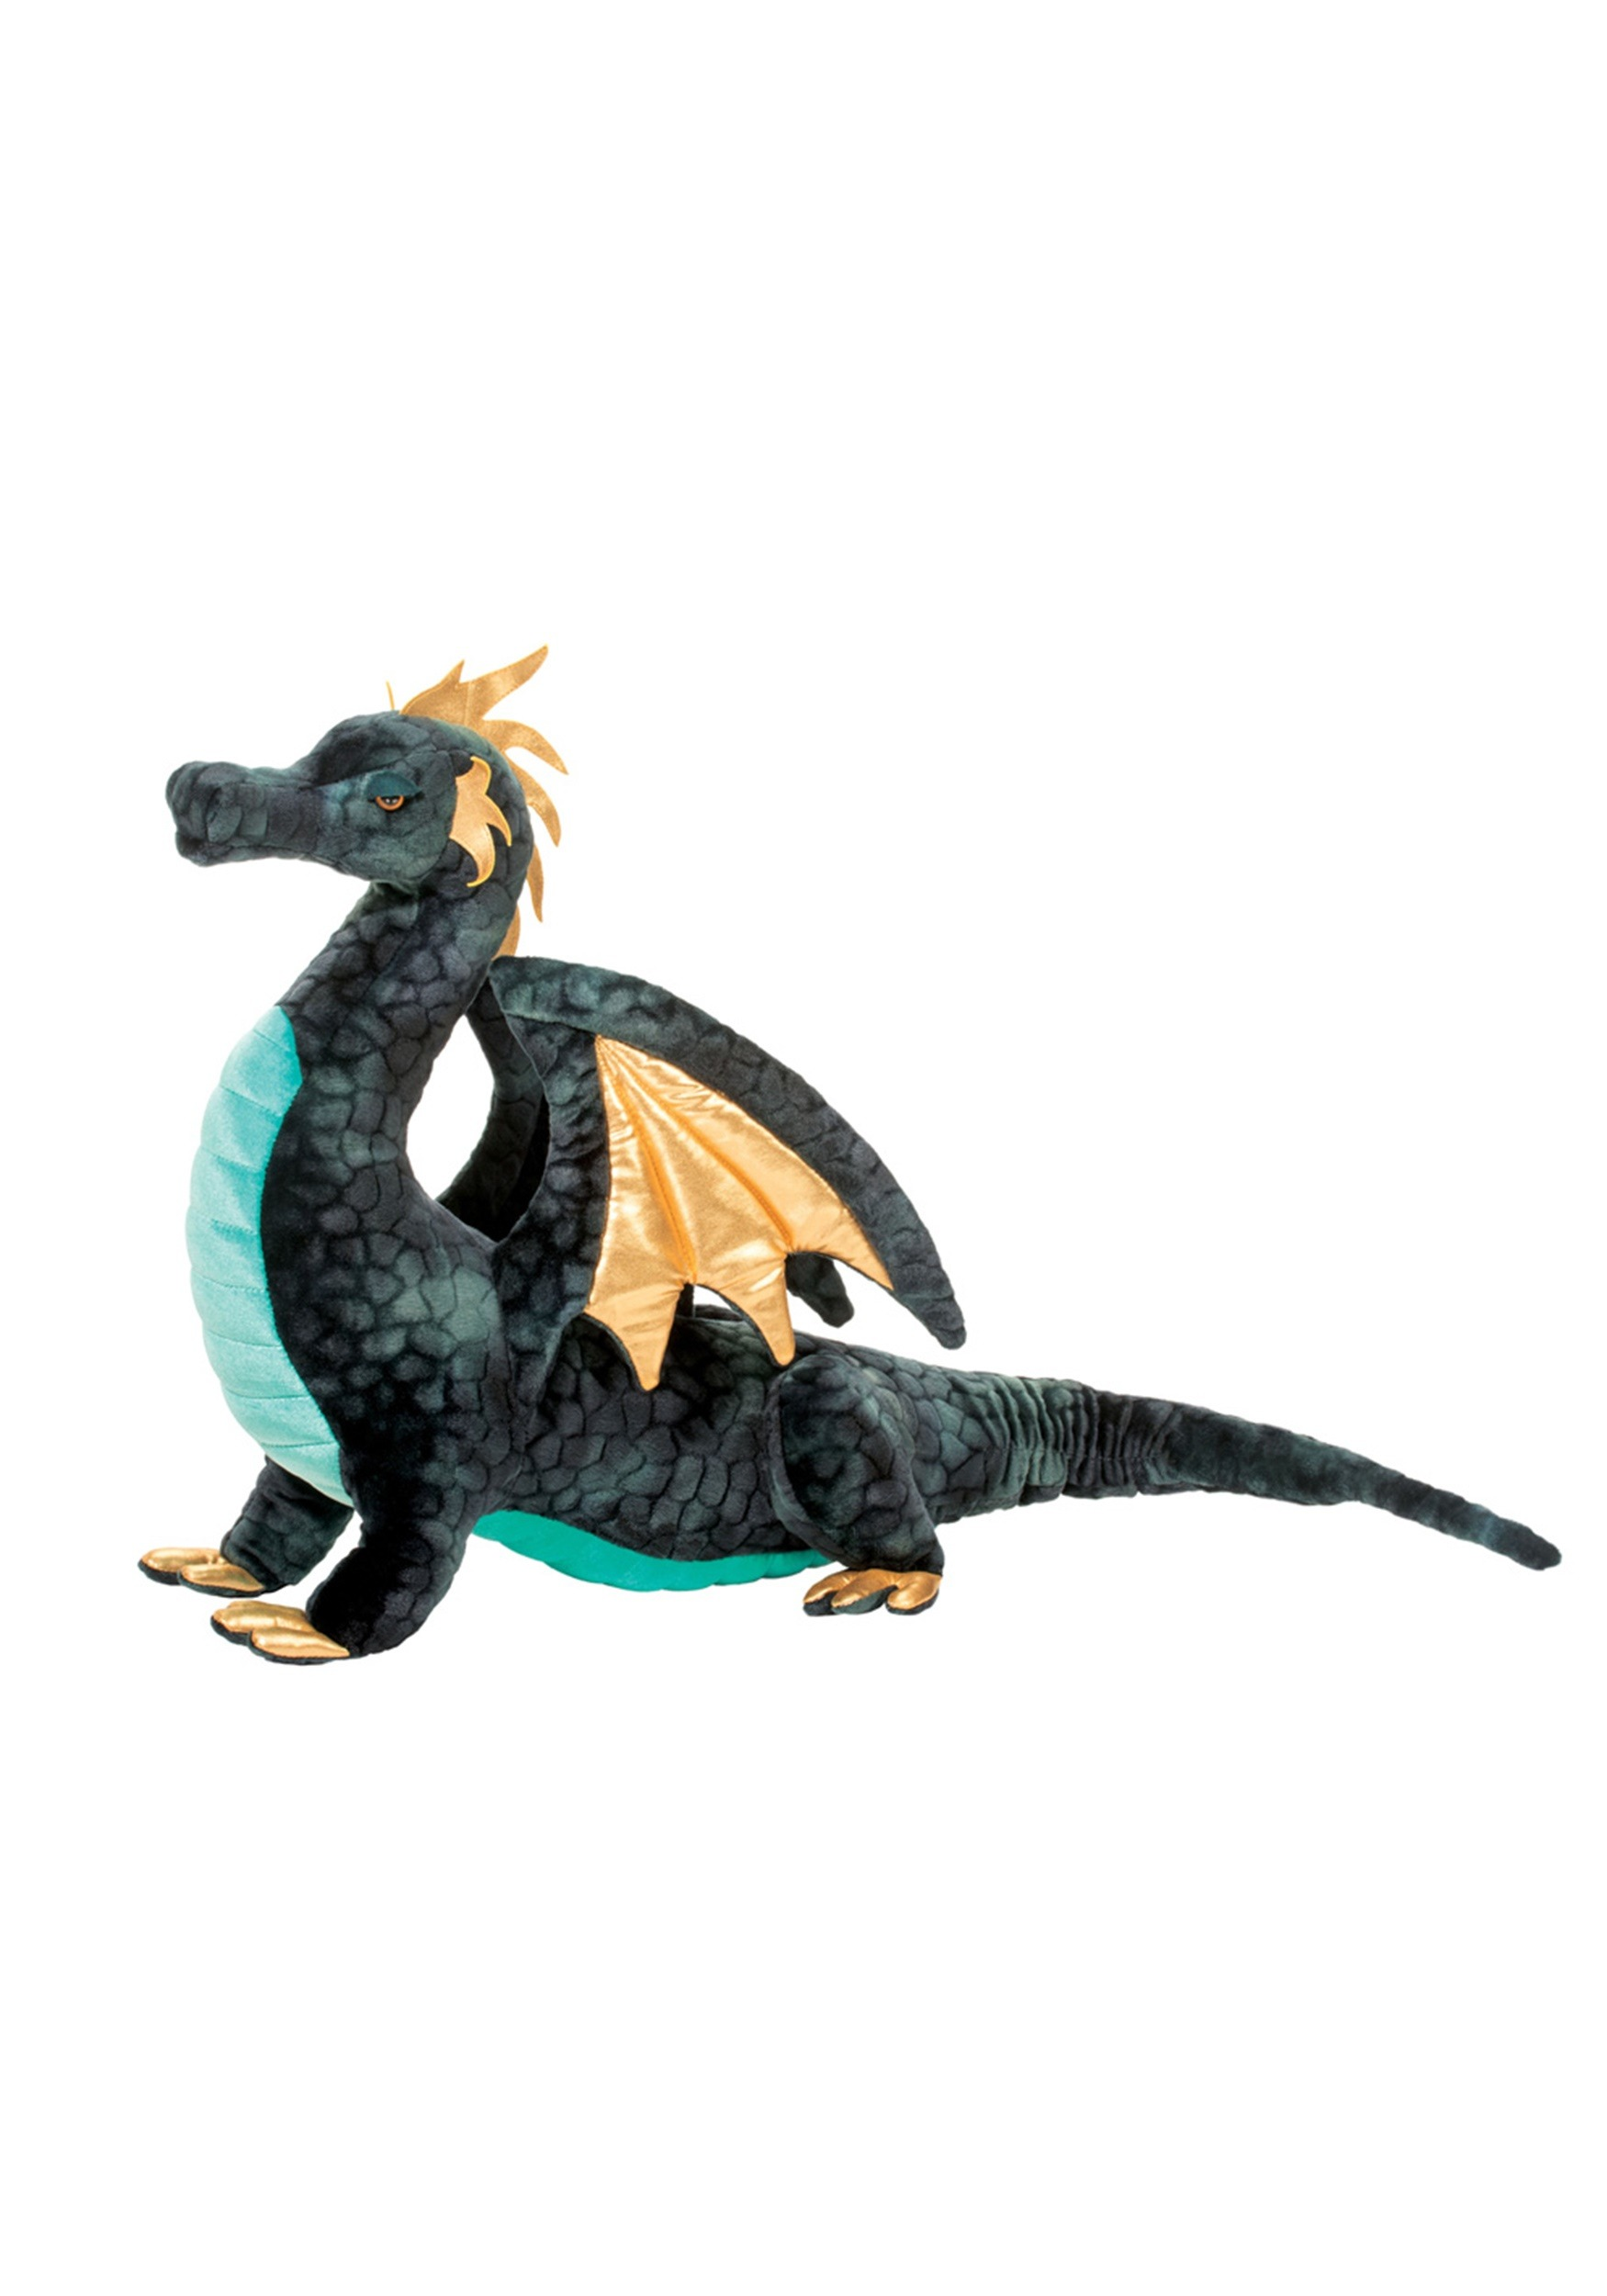 Aragon the Dragon Plush Stuffed Animal Toy 77d0519b7